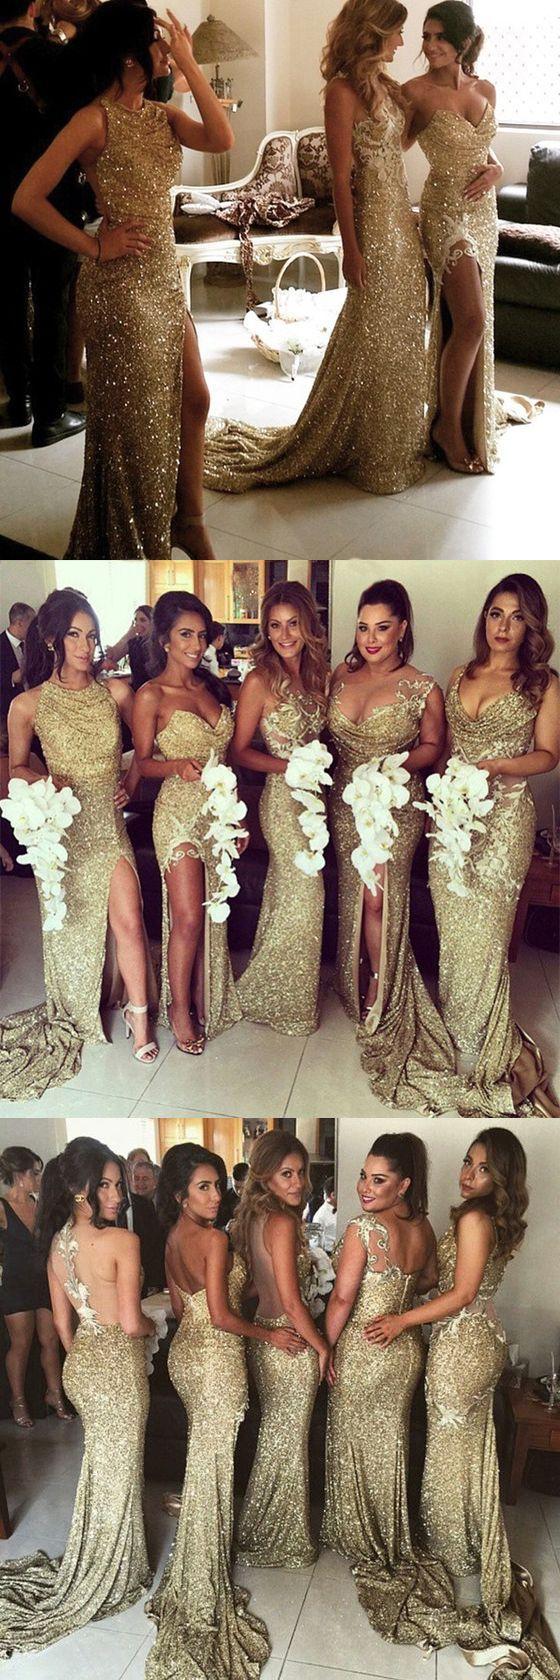 Sequin bridesmaid dresses, long mismatched bridesmaid dresses, sexy gorgeous bridesmaid dresses, sparkly wedding party dresses,15469